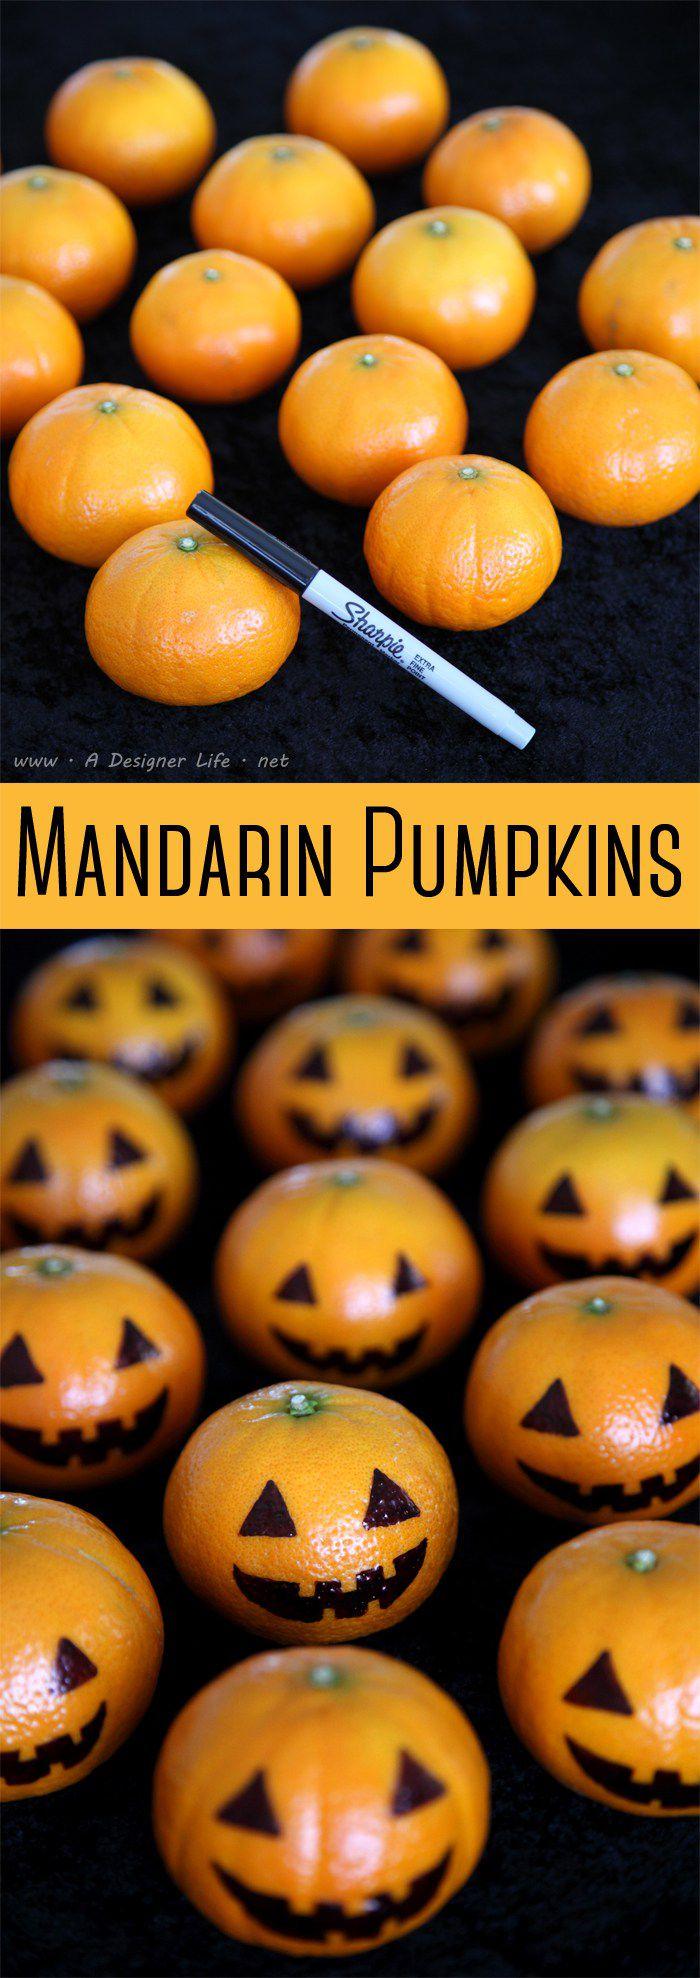 mandarinas para hacer manualidades de calabazas